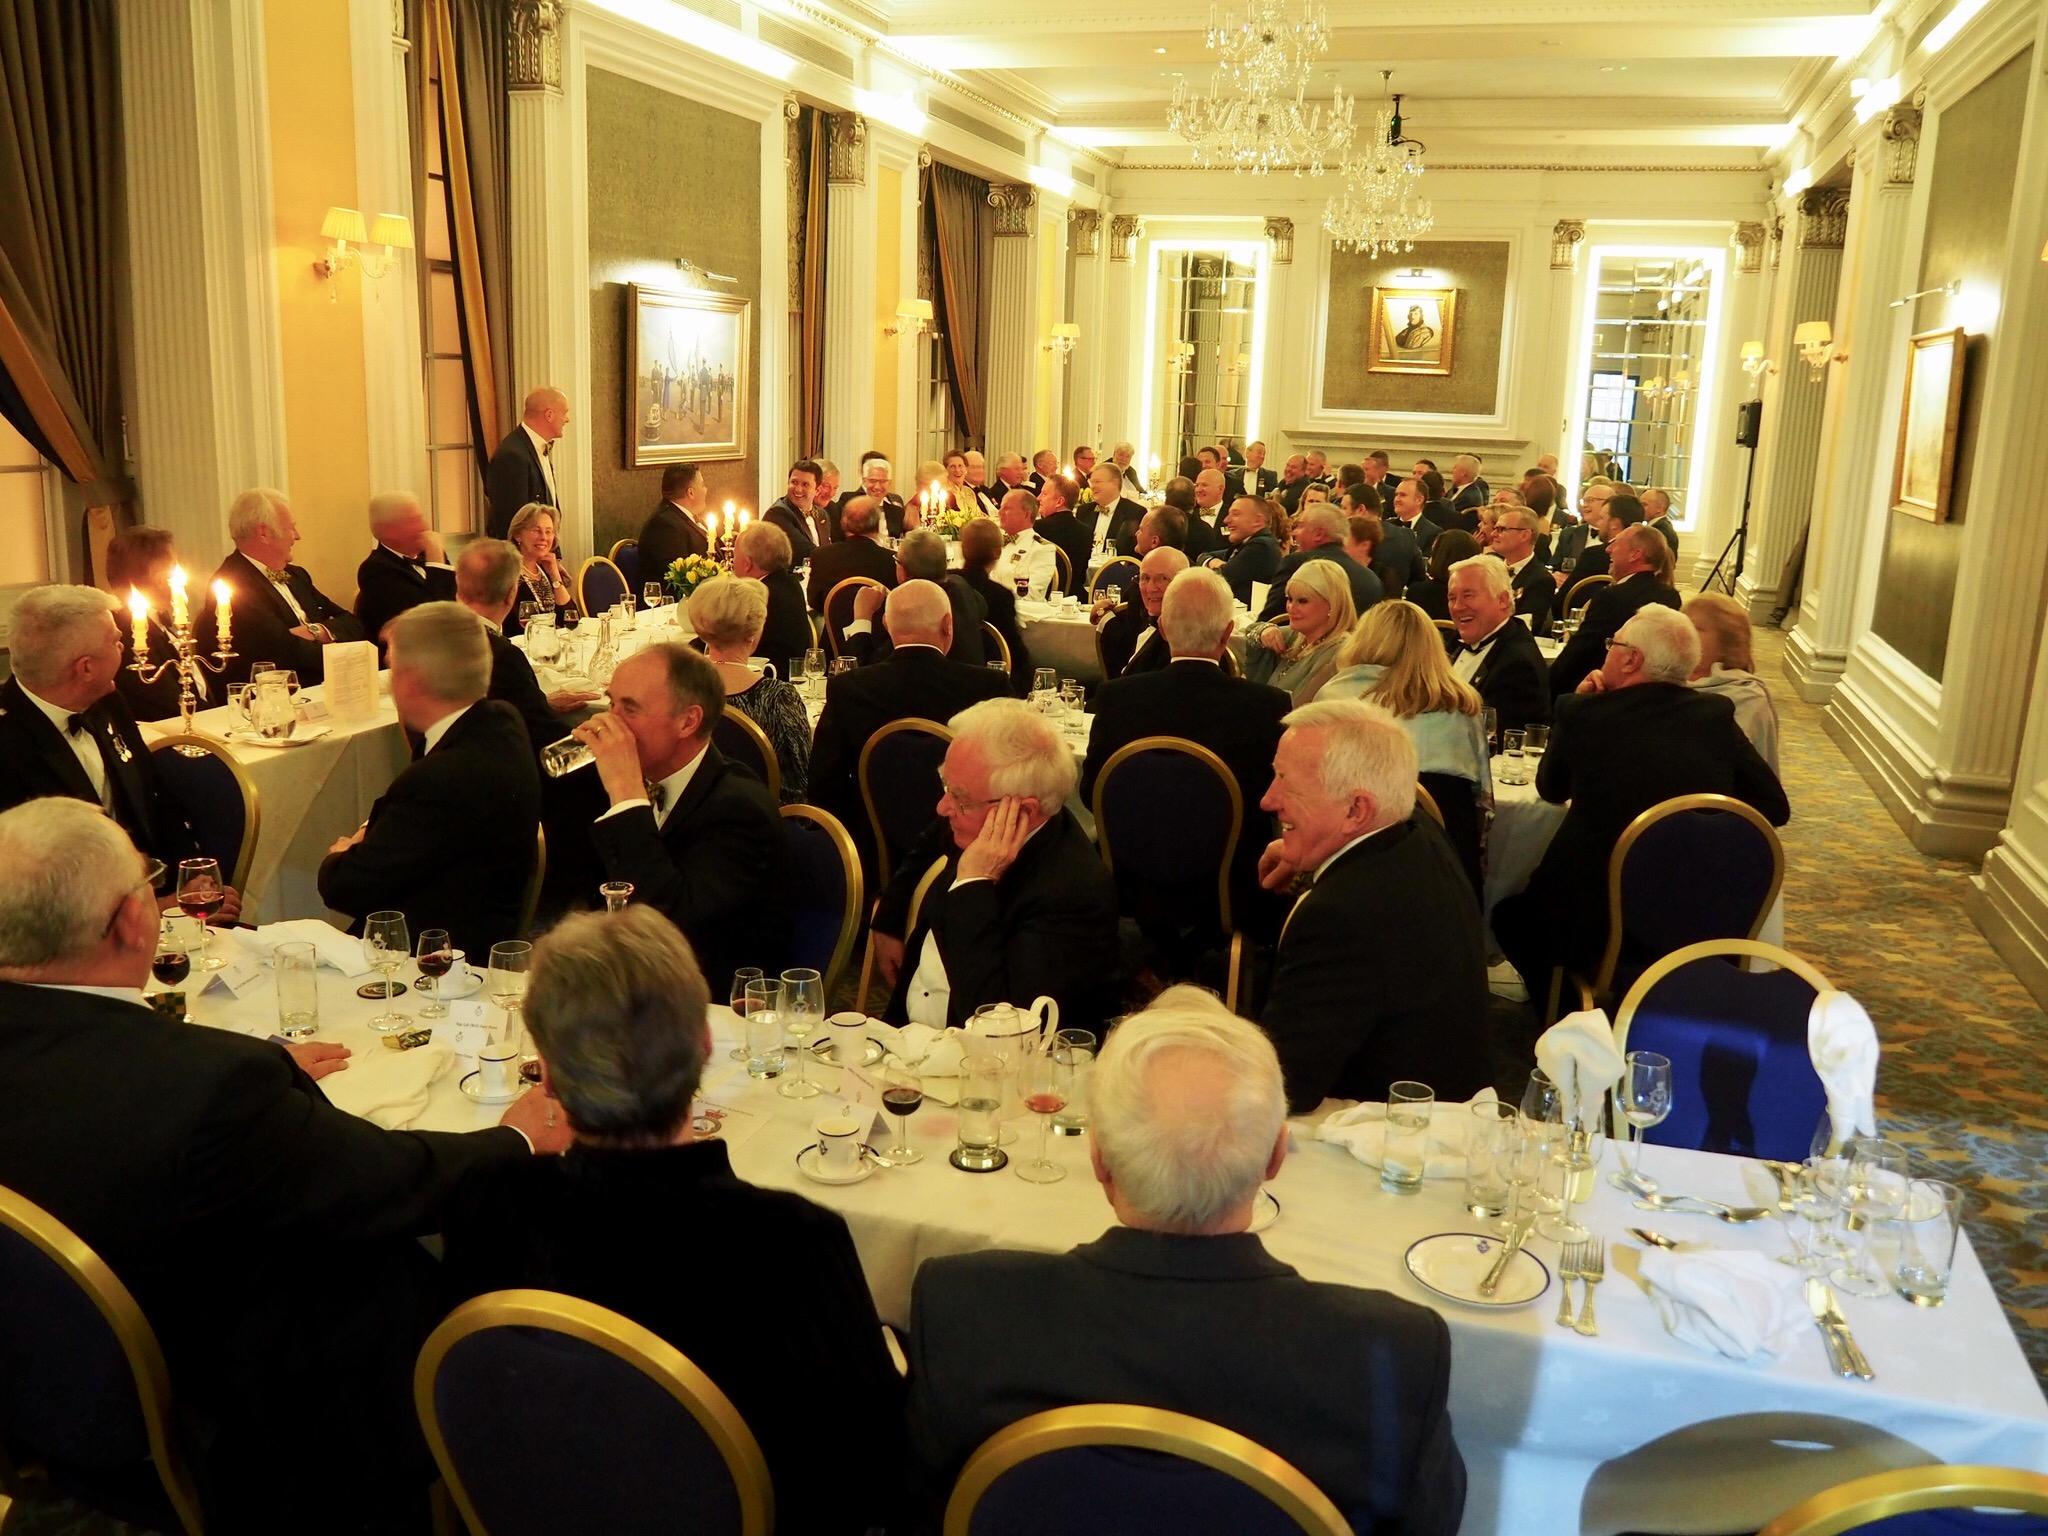 Image of the RAF Club Ballroom event area